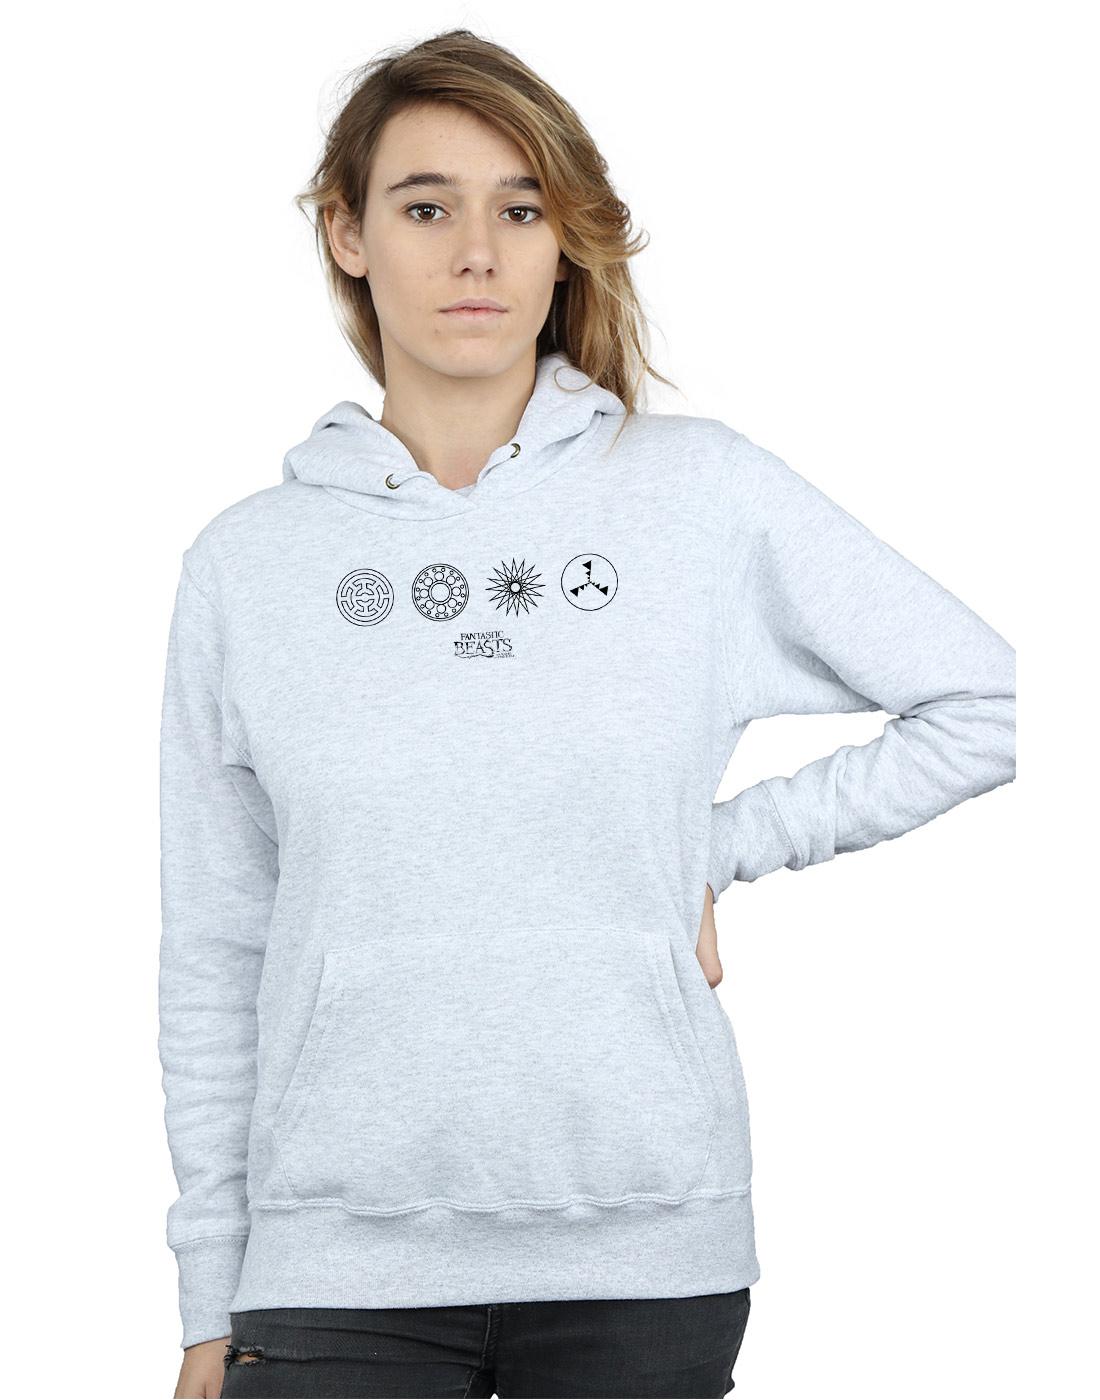 Absolute Cult Friends Girls Door Peephole Sweatshirt